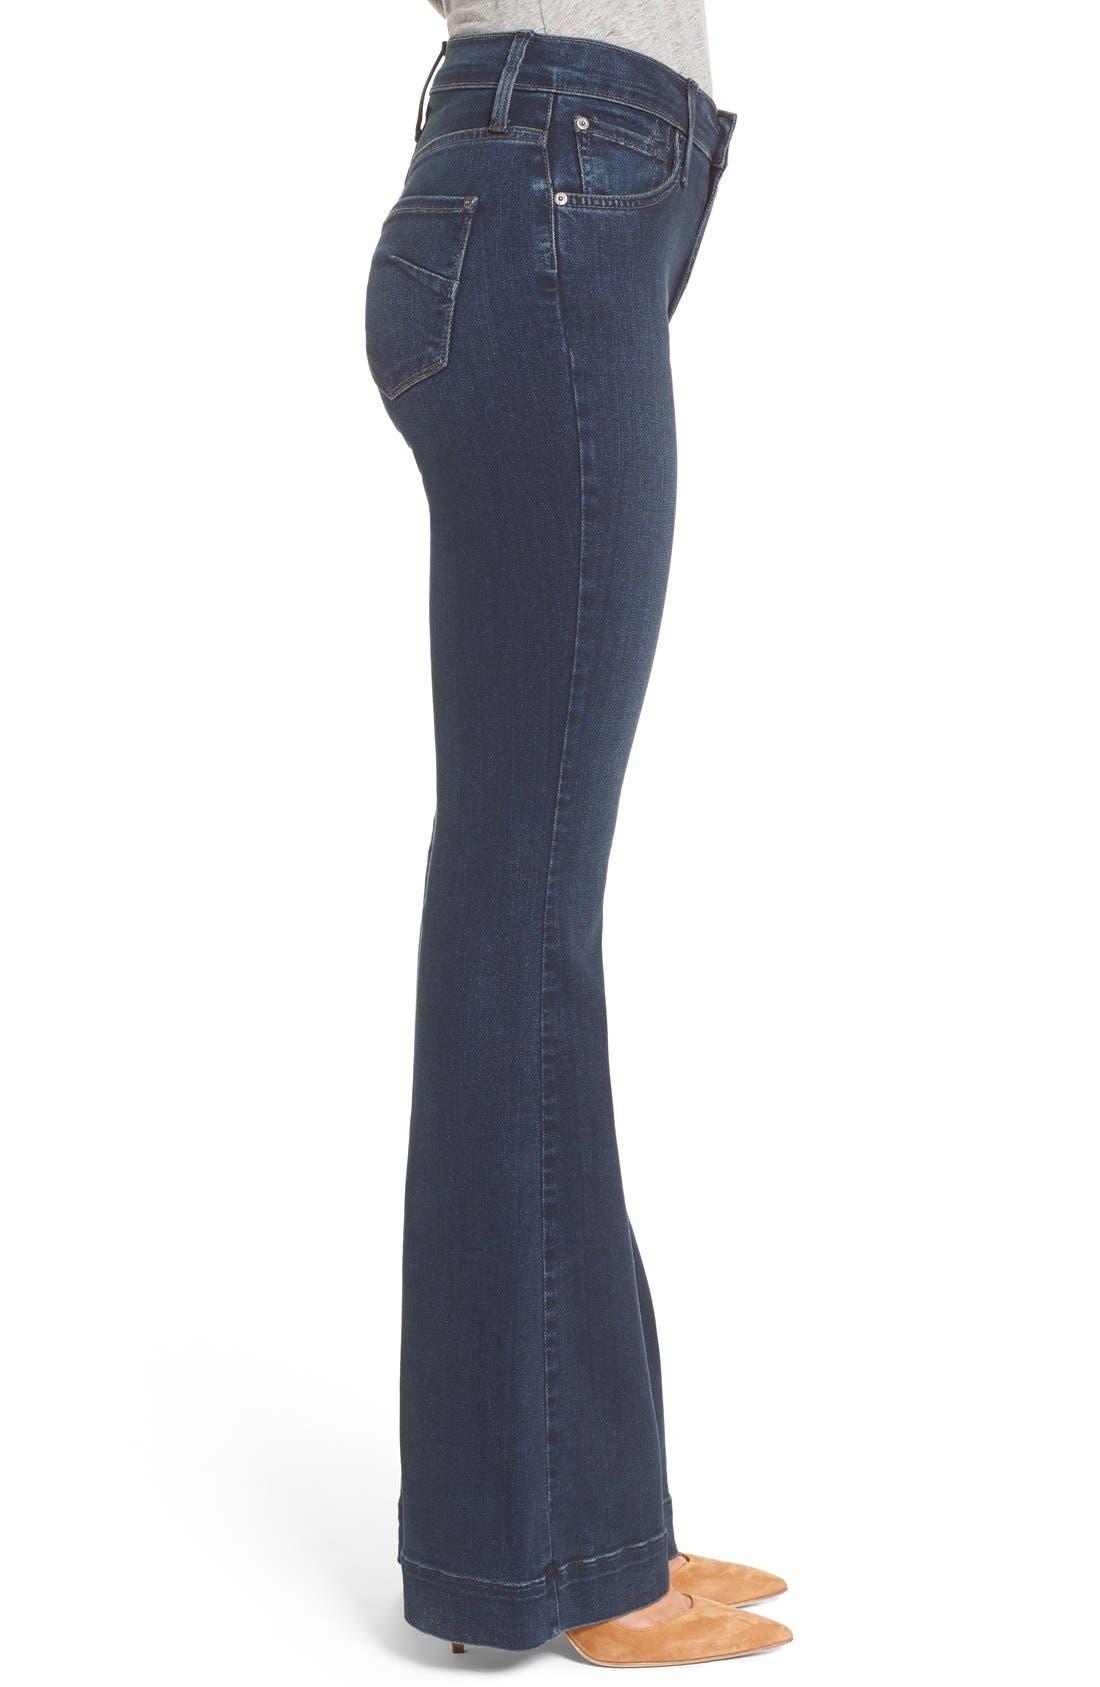 JAMES JEANS,                             'Shayebel' Flare Denim Trousers,                             Alternate thumbnail 3, color,                             401